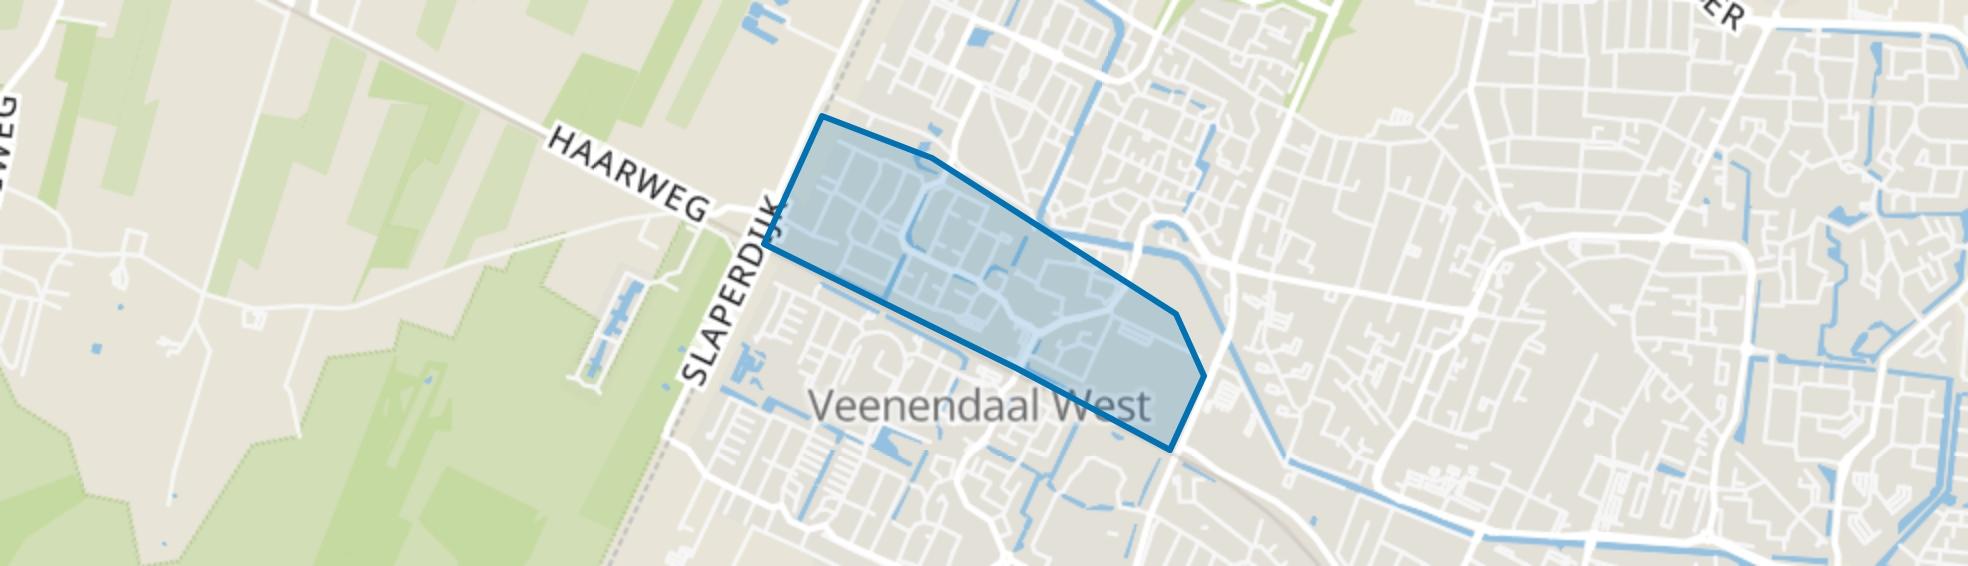 Vogelbuurt, Veenendaal map